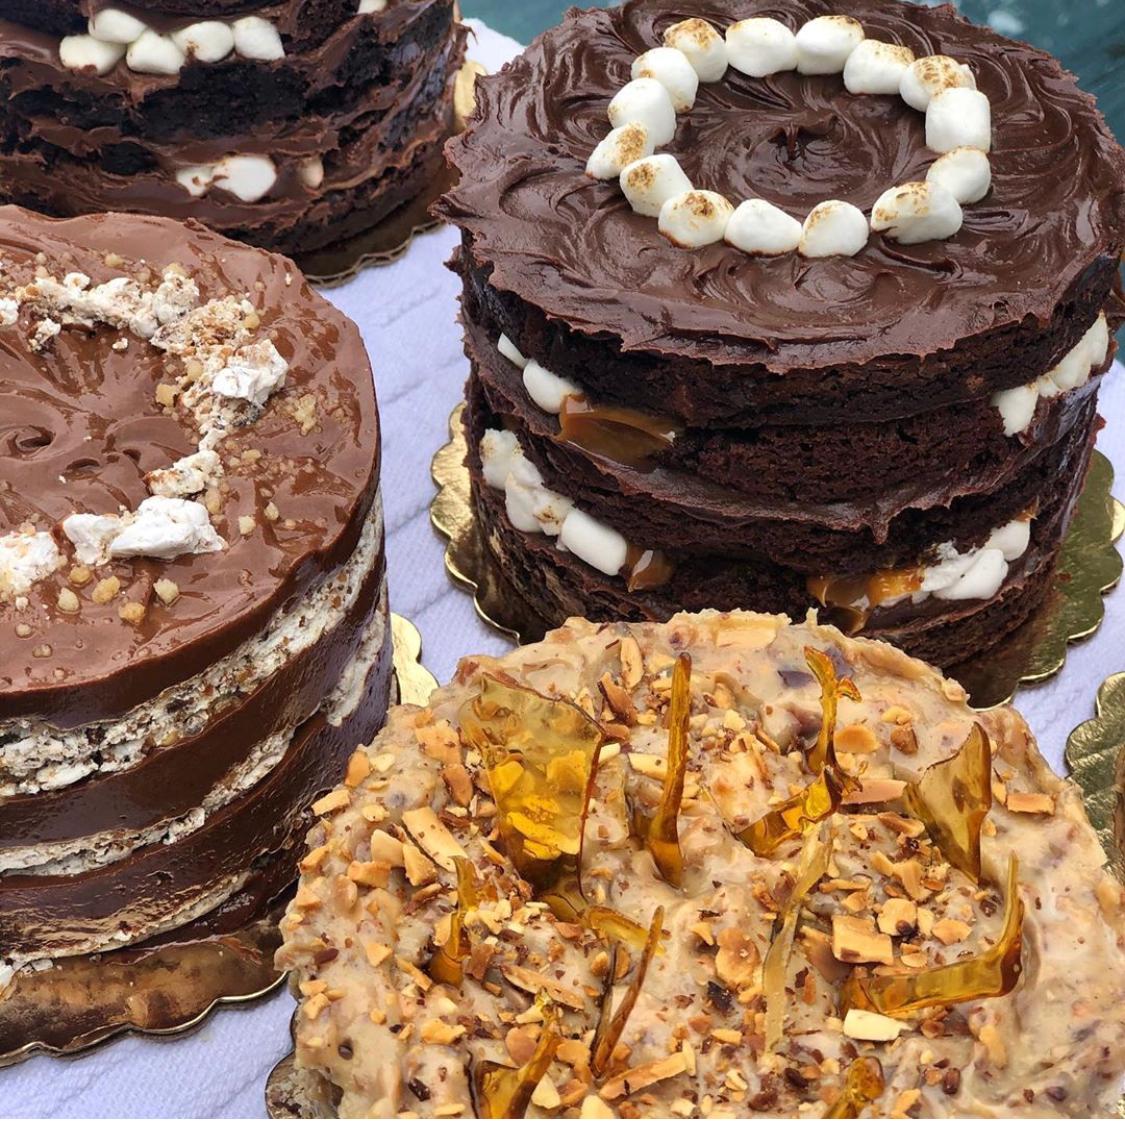 Cakeology by Erika Miami, Florida amazing special occasion birthday cake